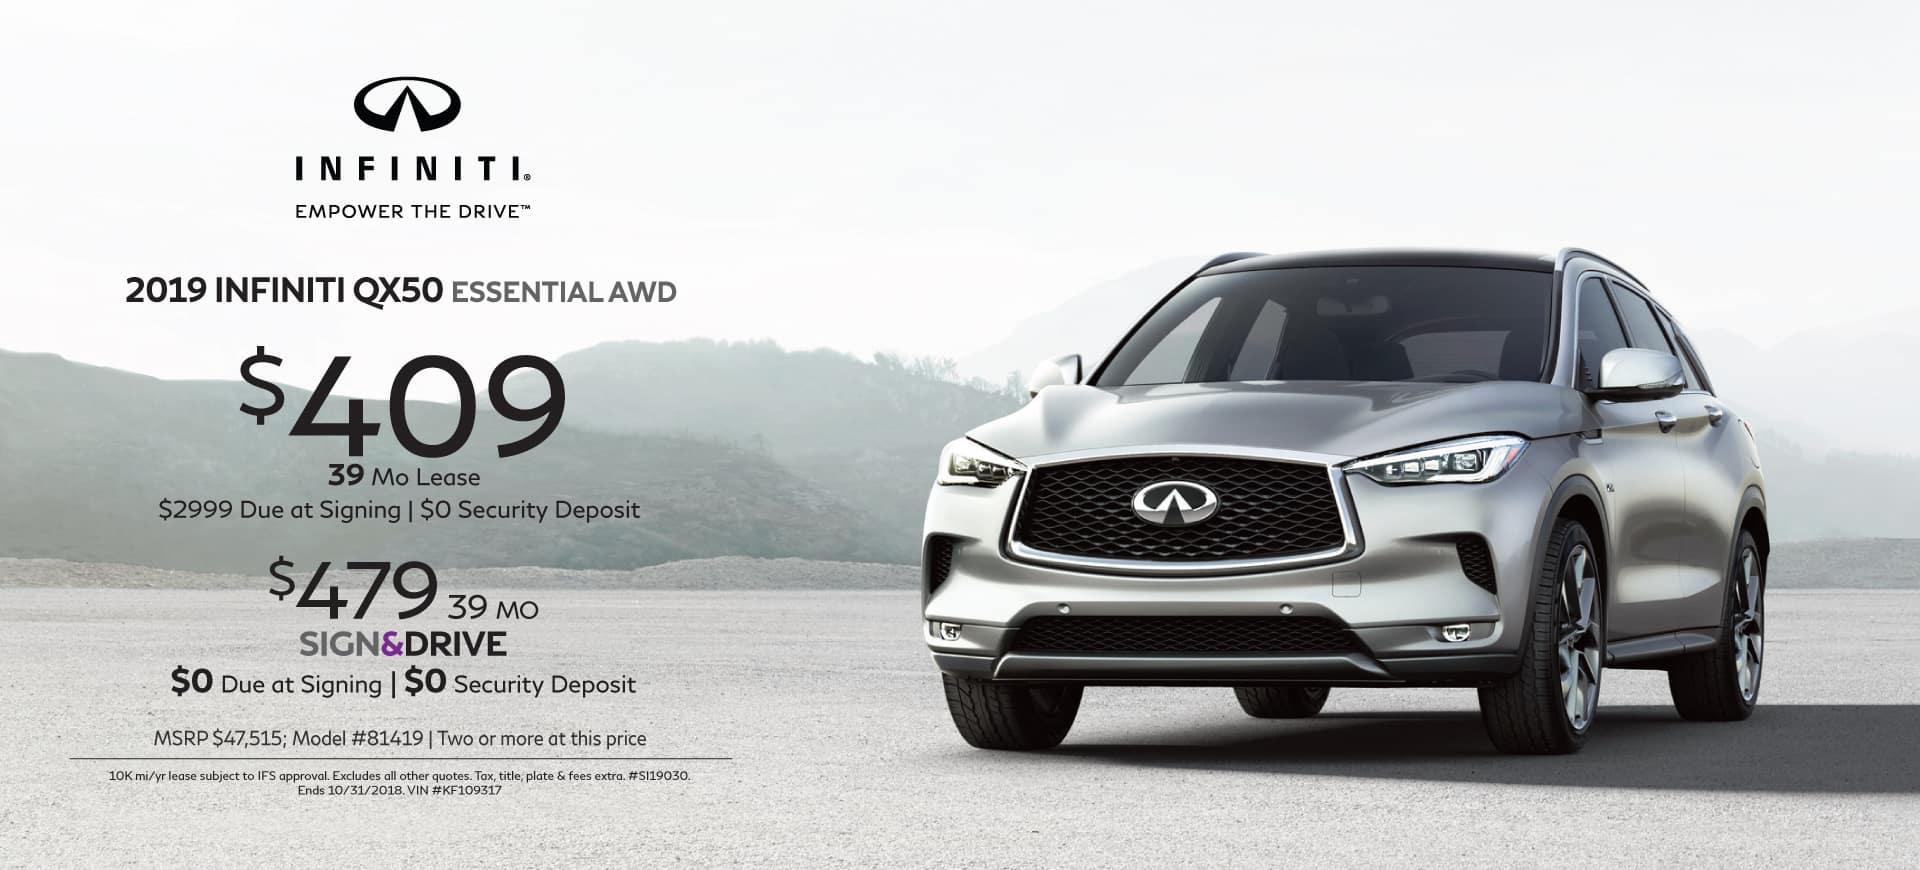 2019 INFINITI specials QX50 ESSENTIAL AWD